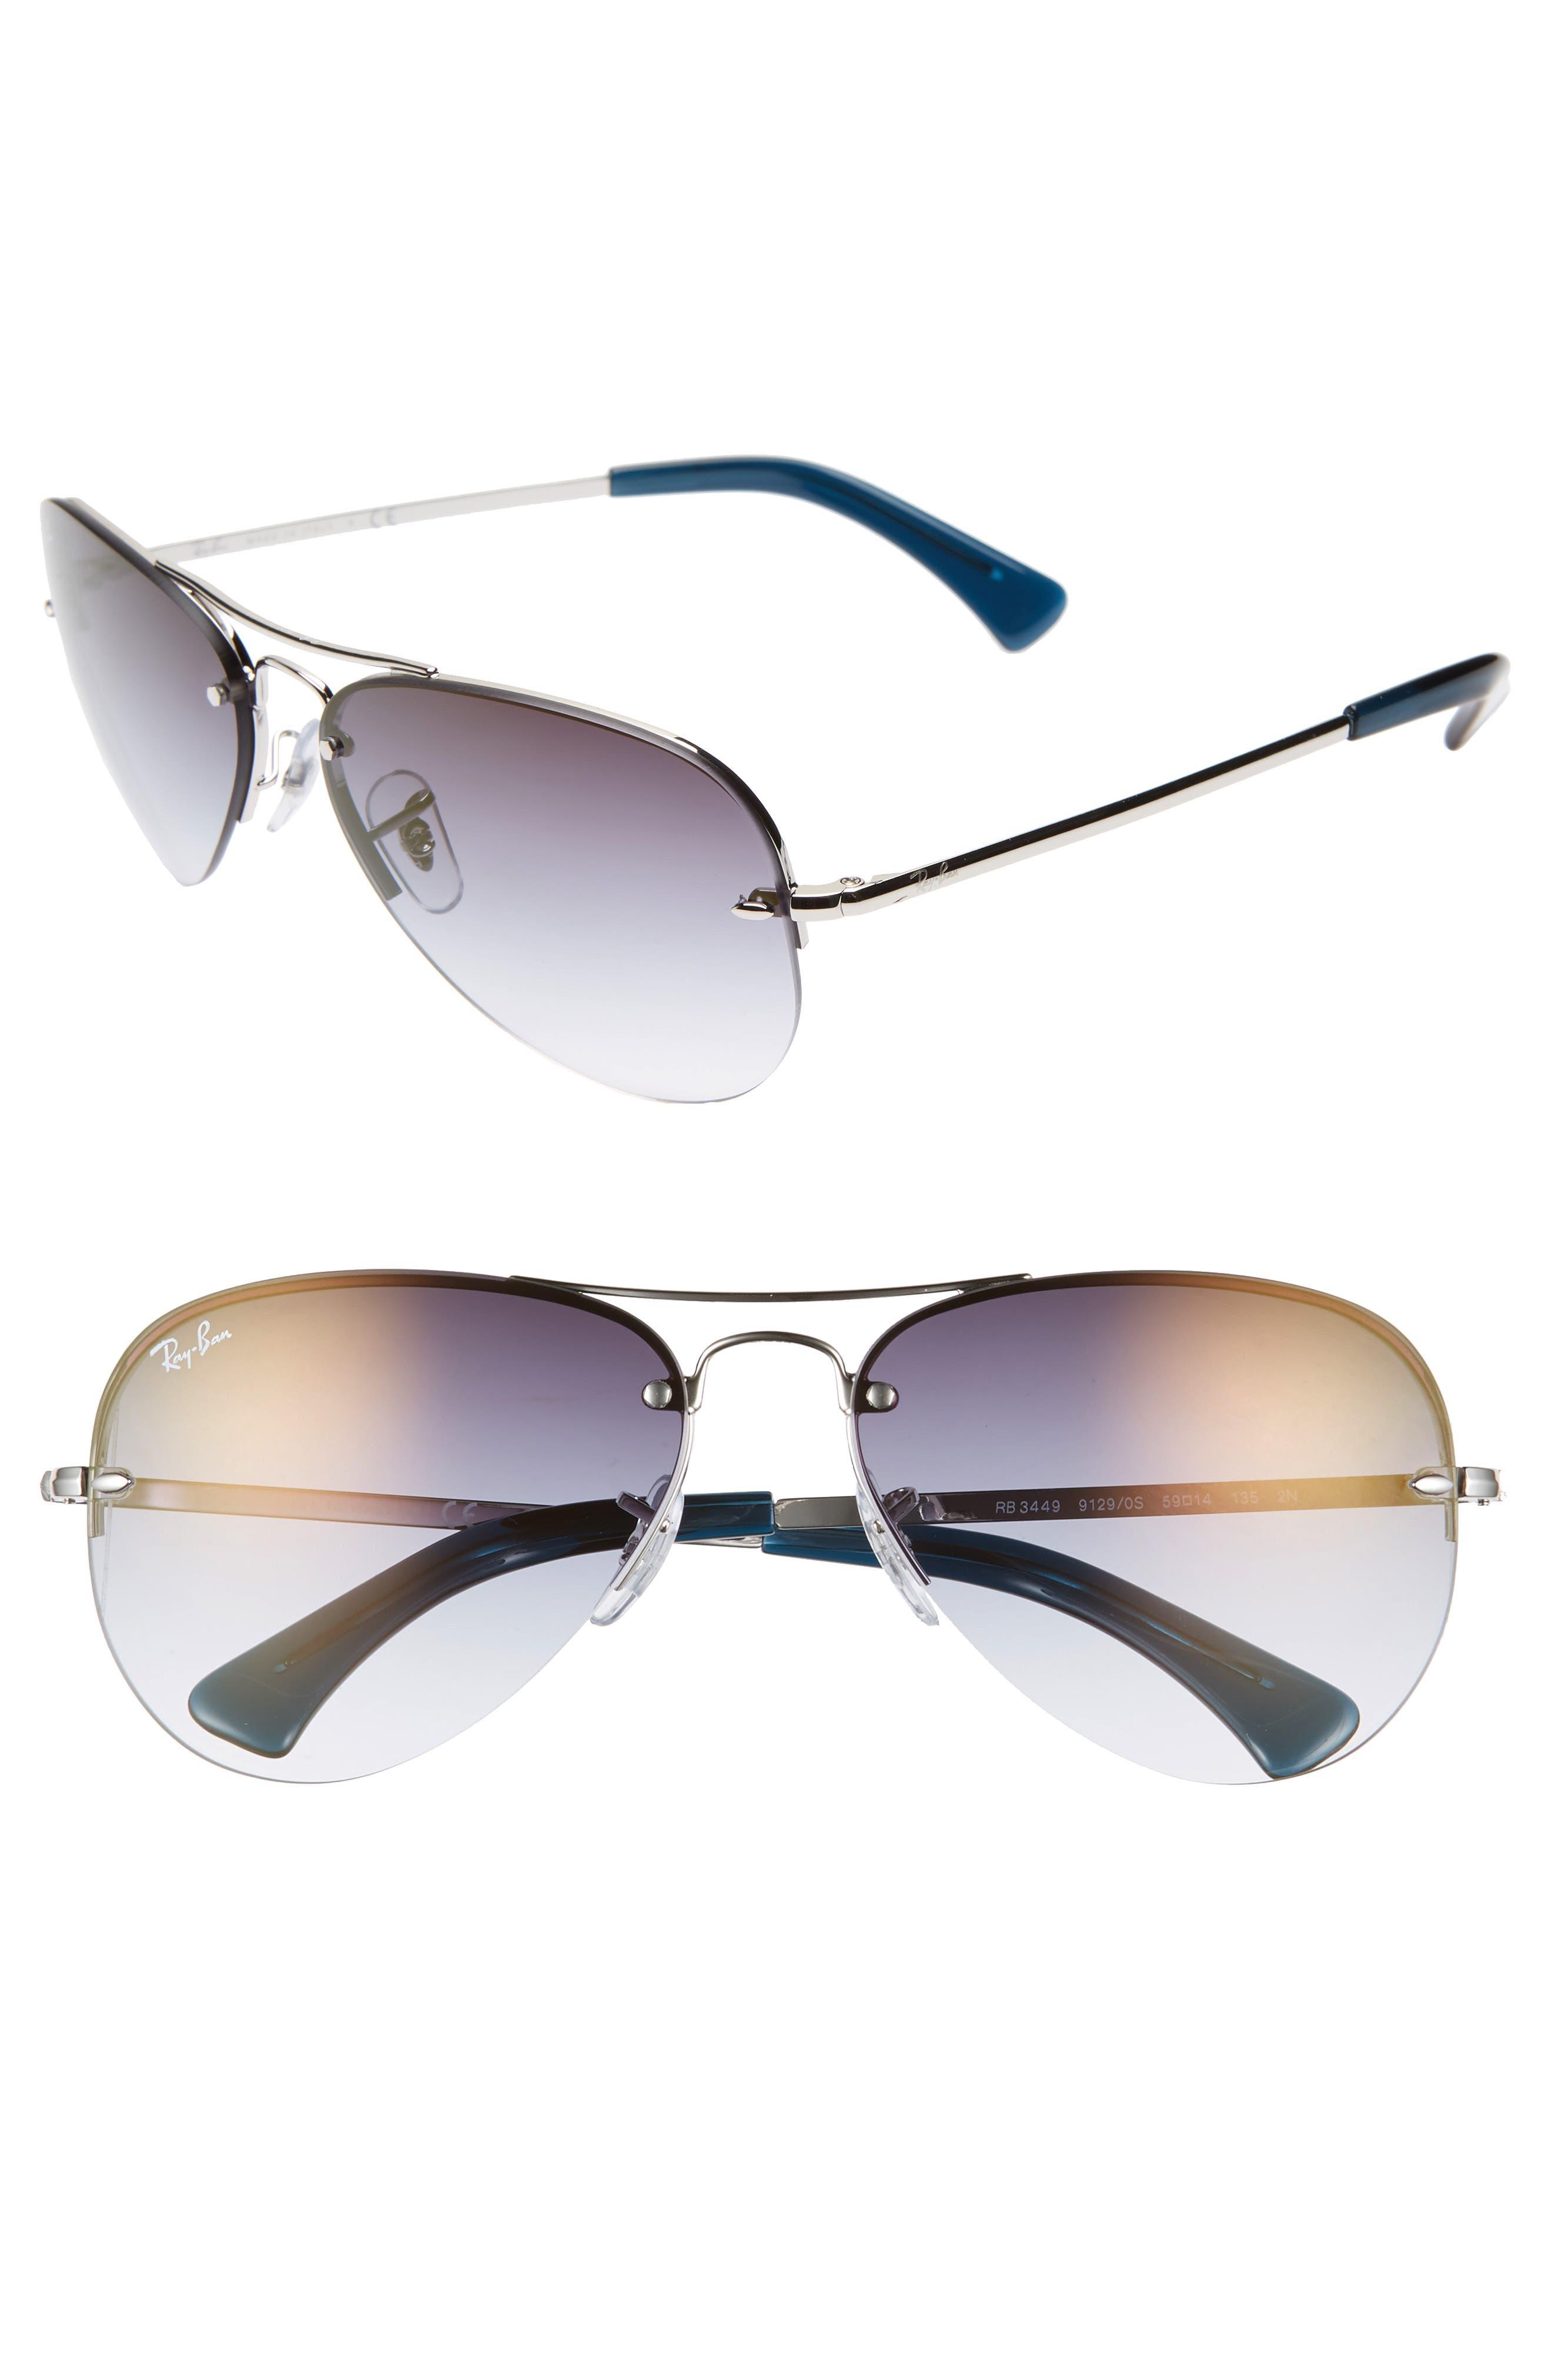 Ray-Ban Highstreet 5m Semi Rimless Aviator Sunglasses - Silver/ Silver Gradient